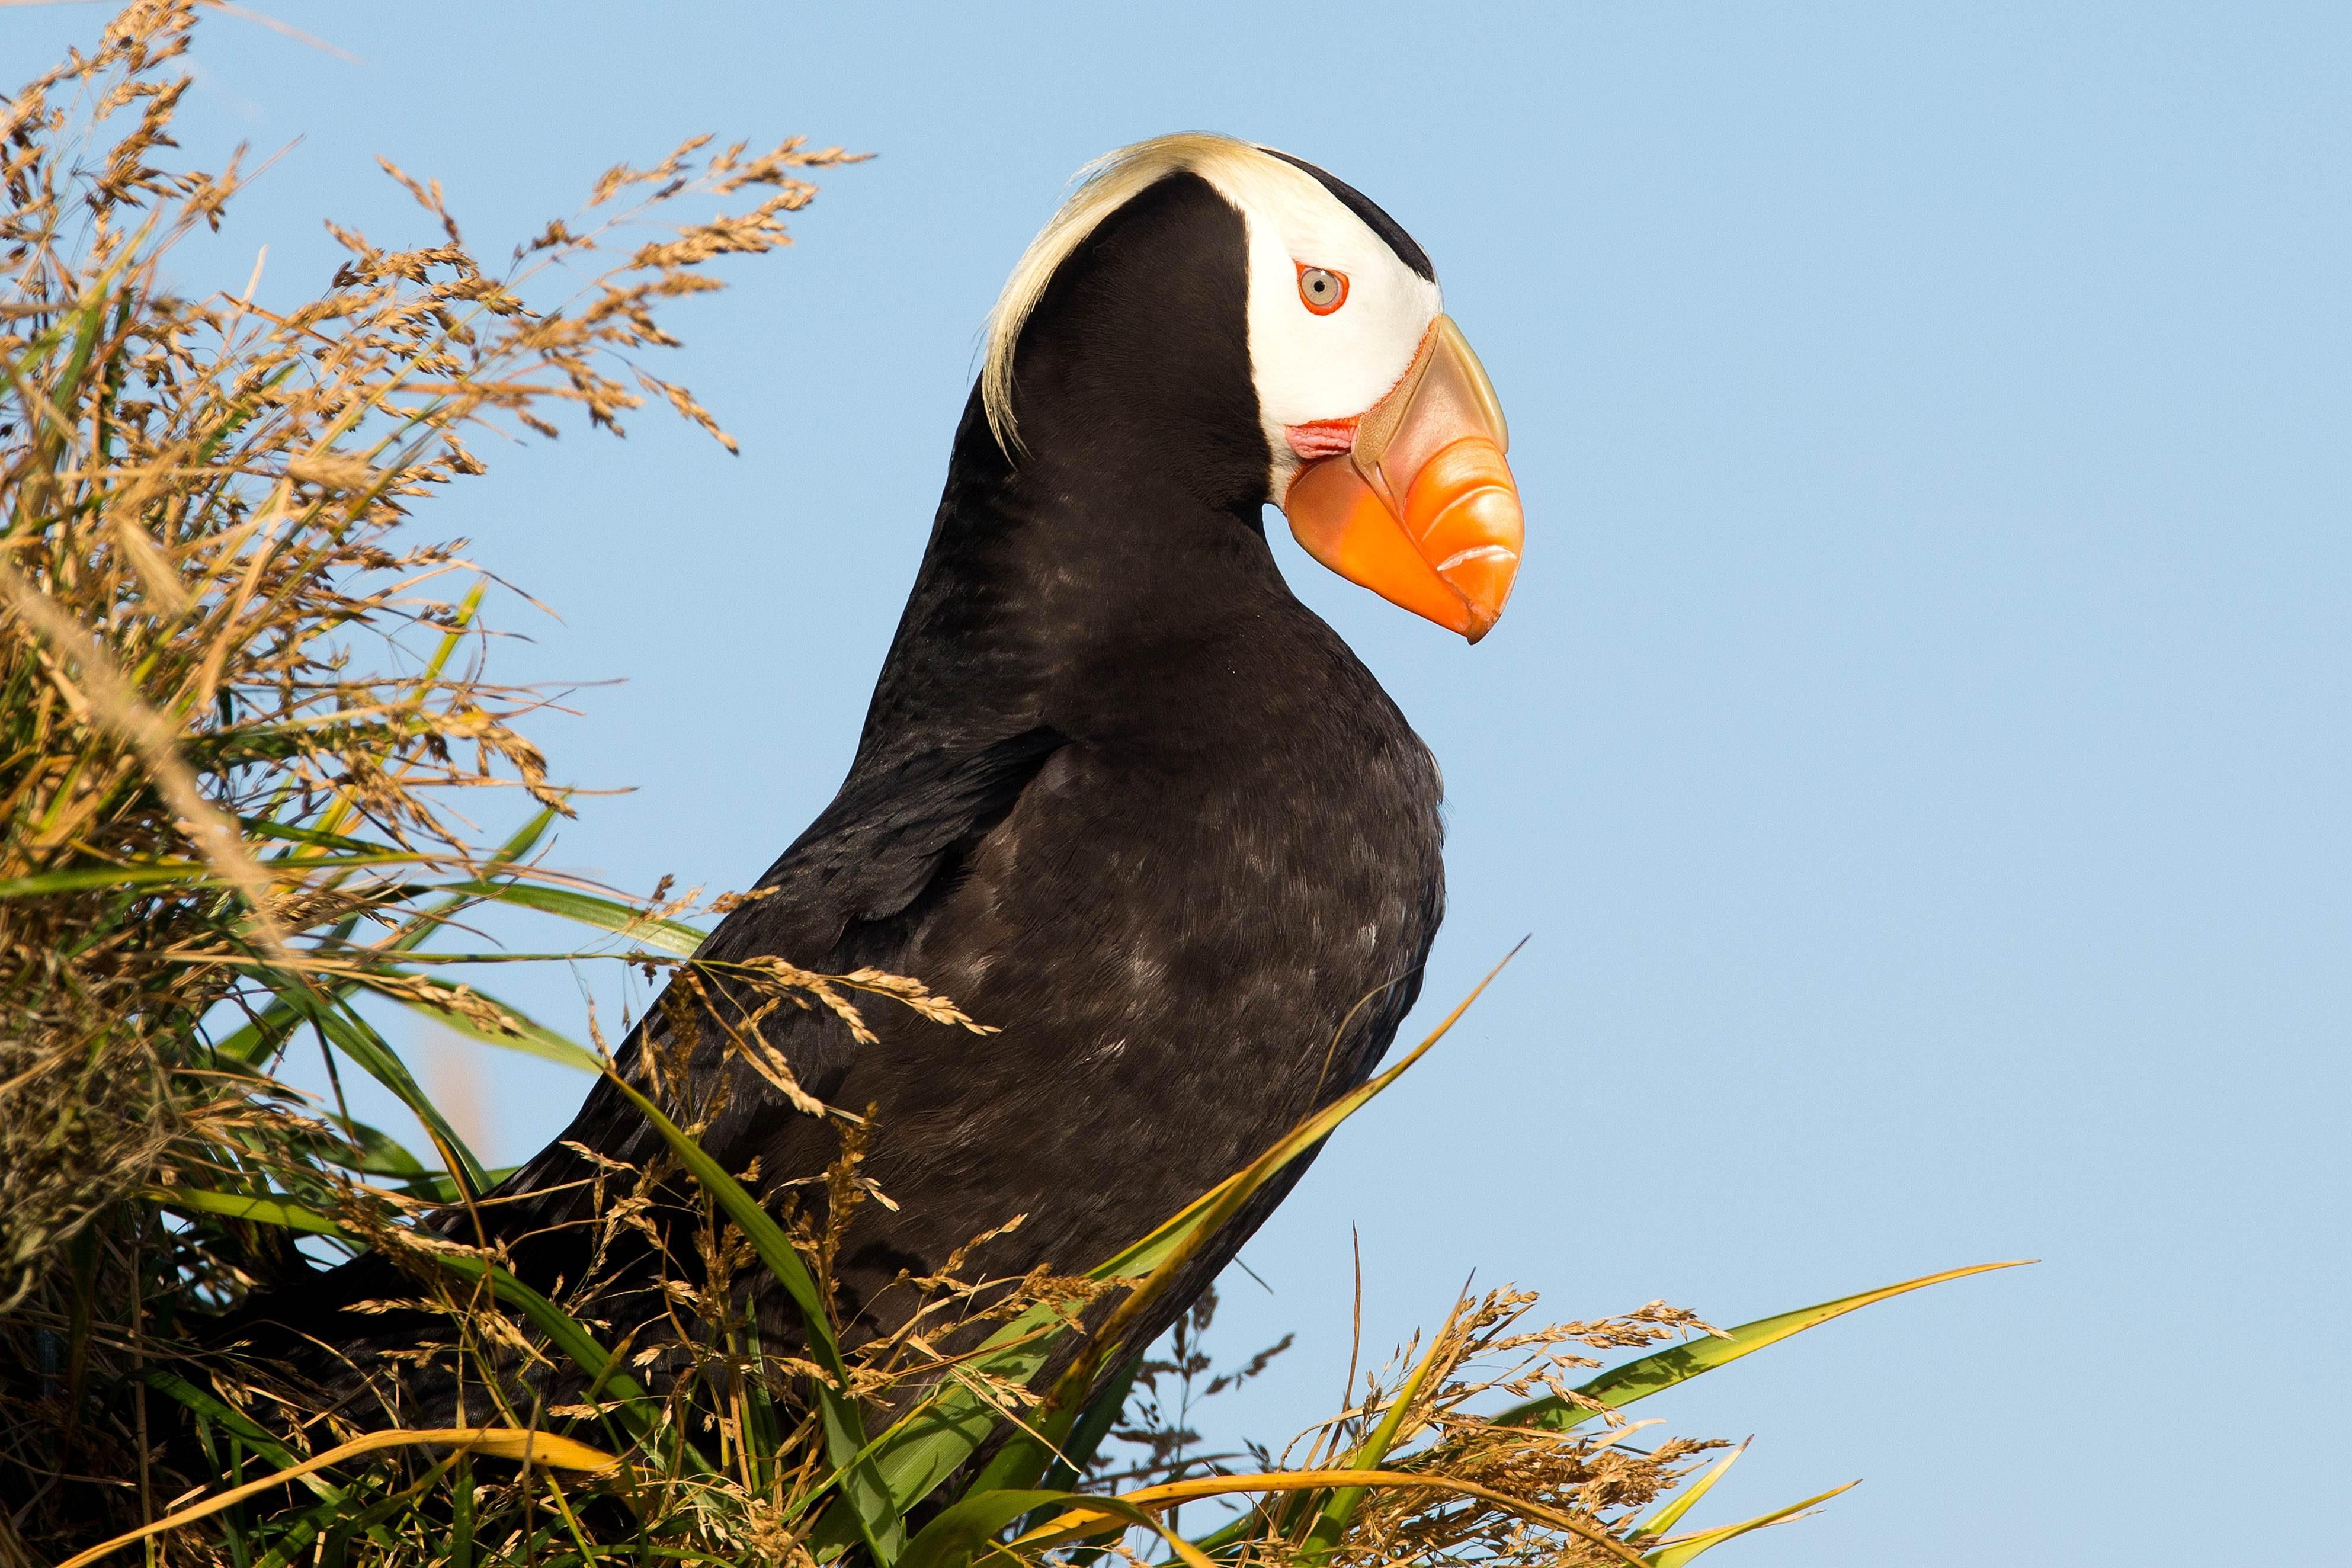 Free photograph; alaska, tuften, puffin, bird